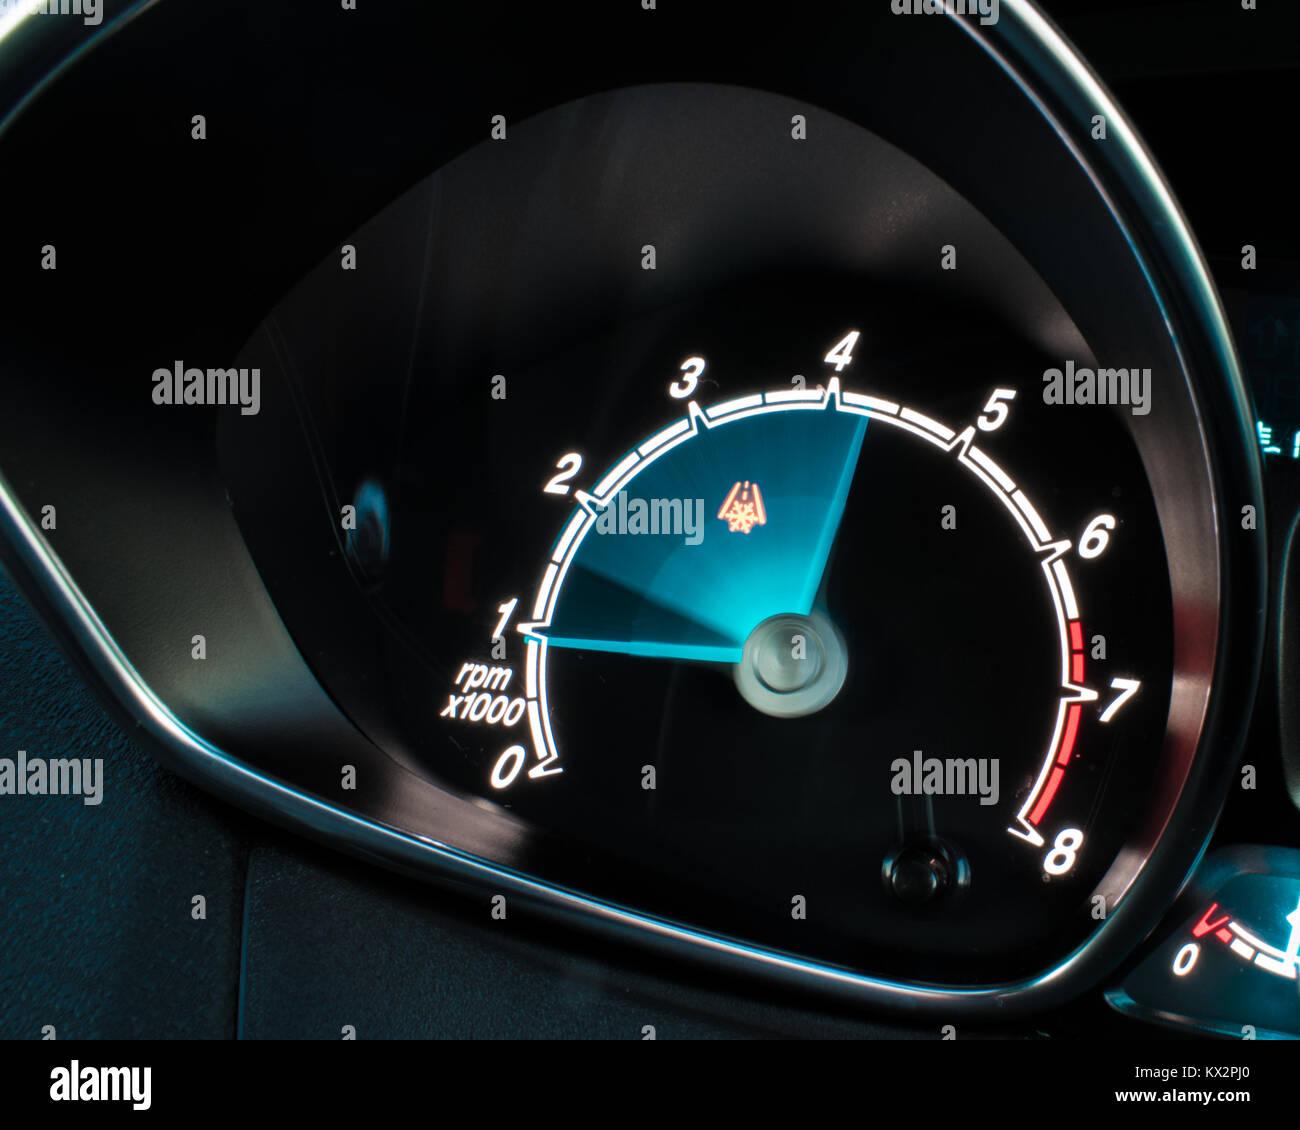 Tachometer / Rev-Counter / RPM Gauge Long Exposure (Ford Fiesta) - Stock Image